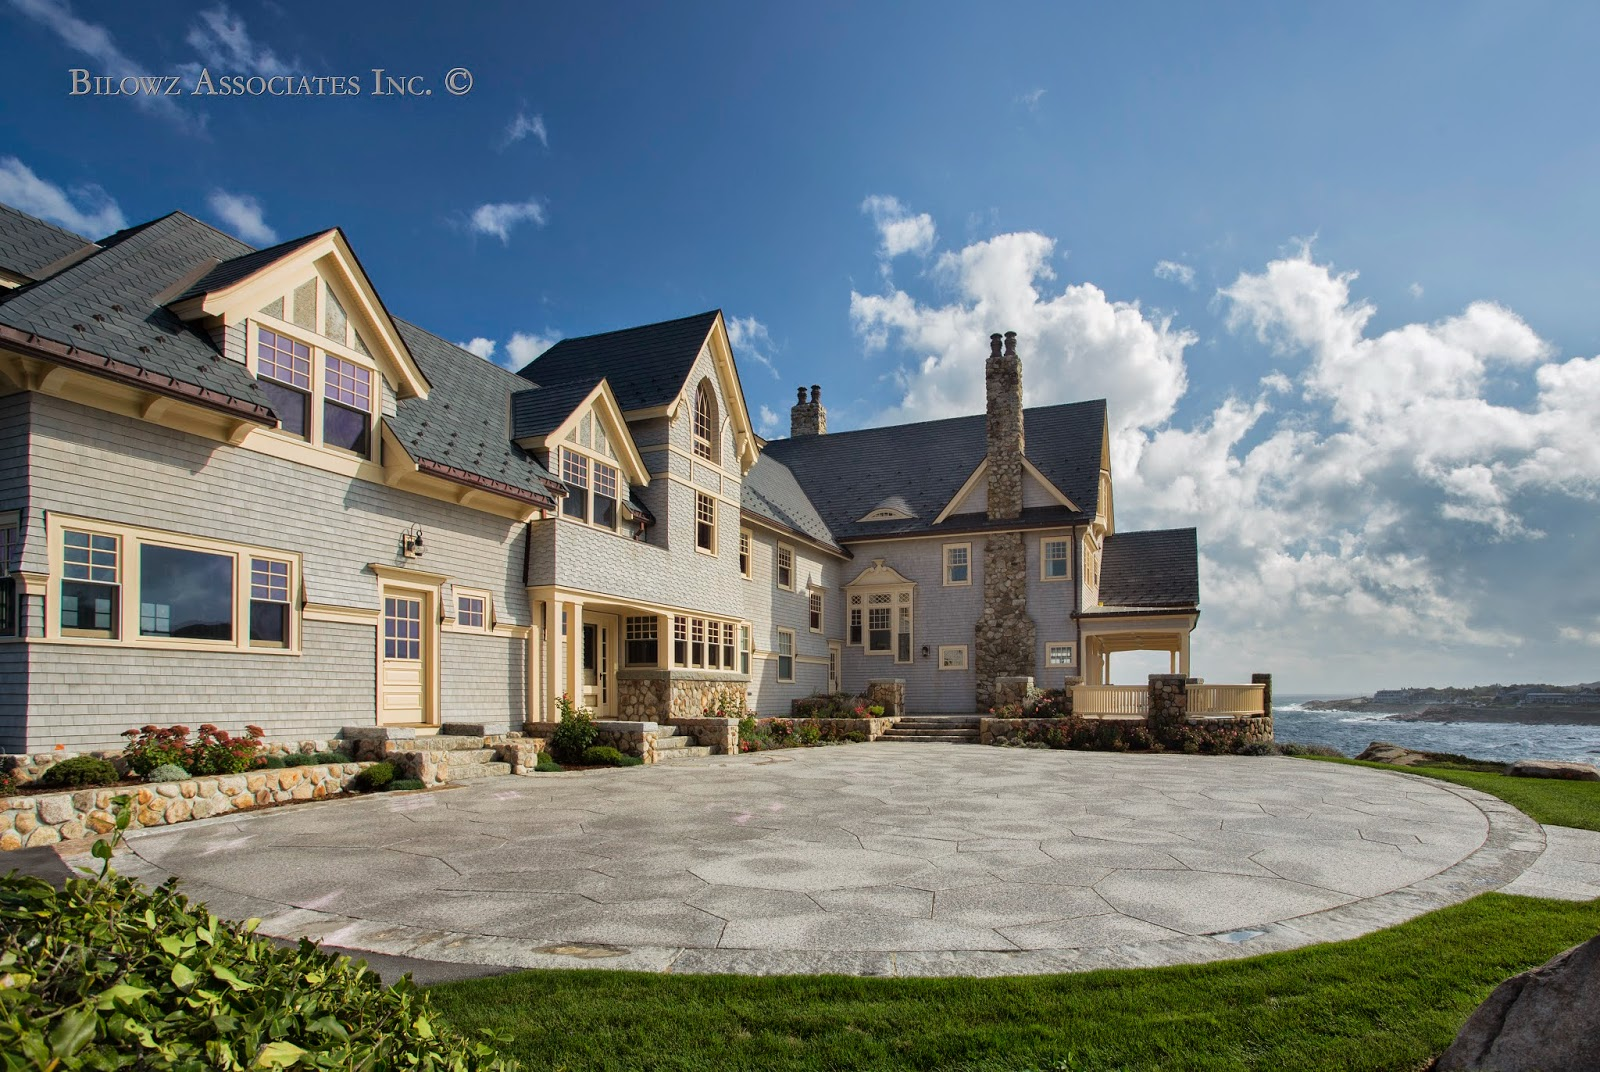 Coastal property - landscape architecture/design